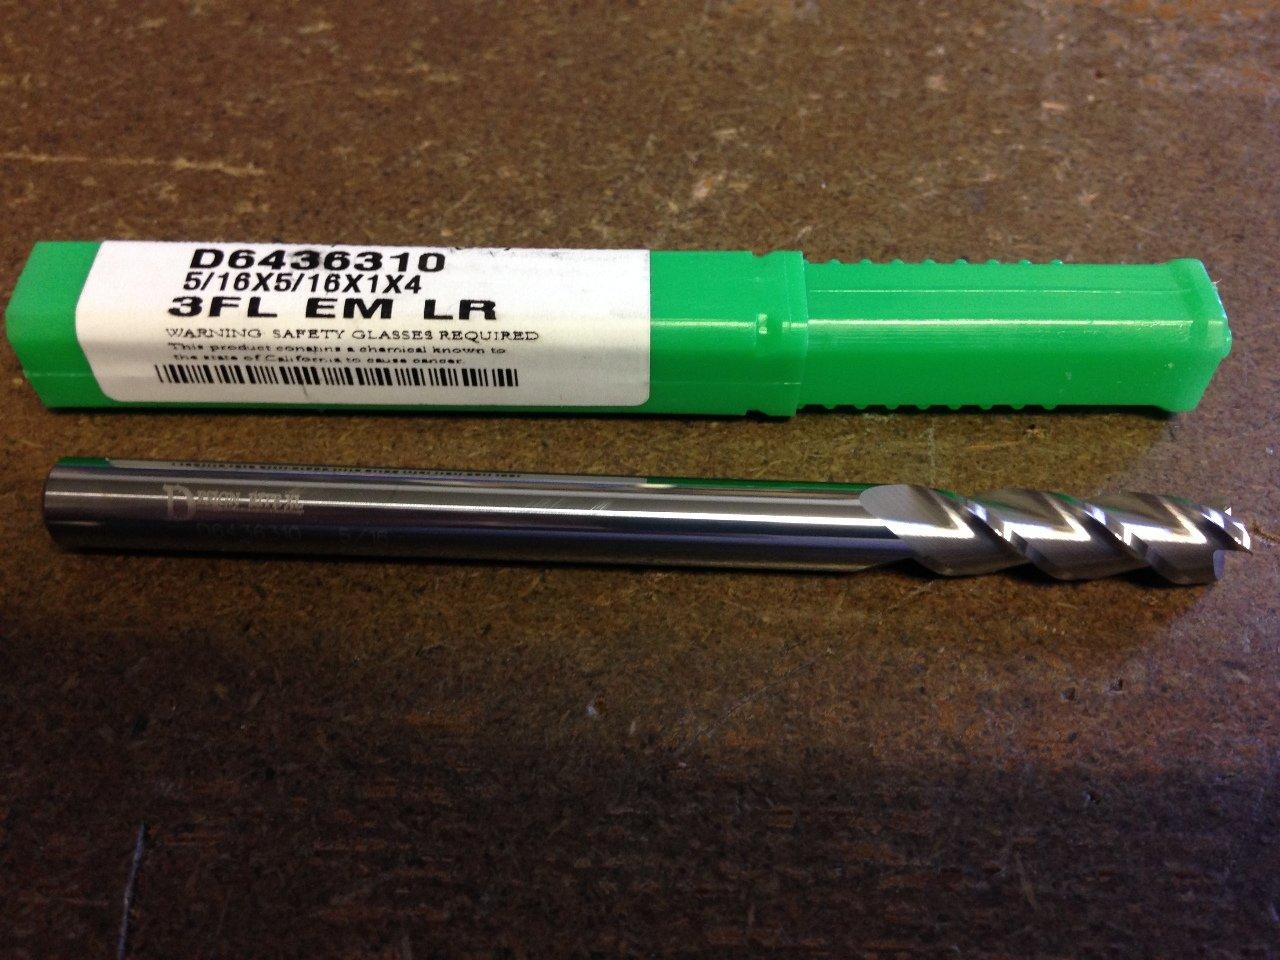 .3125'' 5/16'' 3 Flute Long Length Carbide END Mill 5/16'' x 5/16'' x 1'' x 4'' by DESIGN-RITE